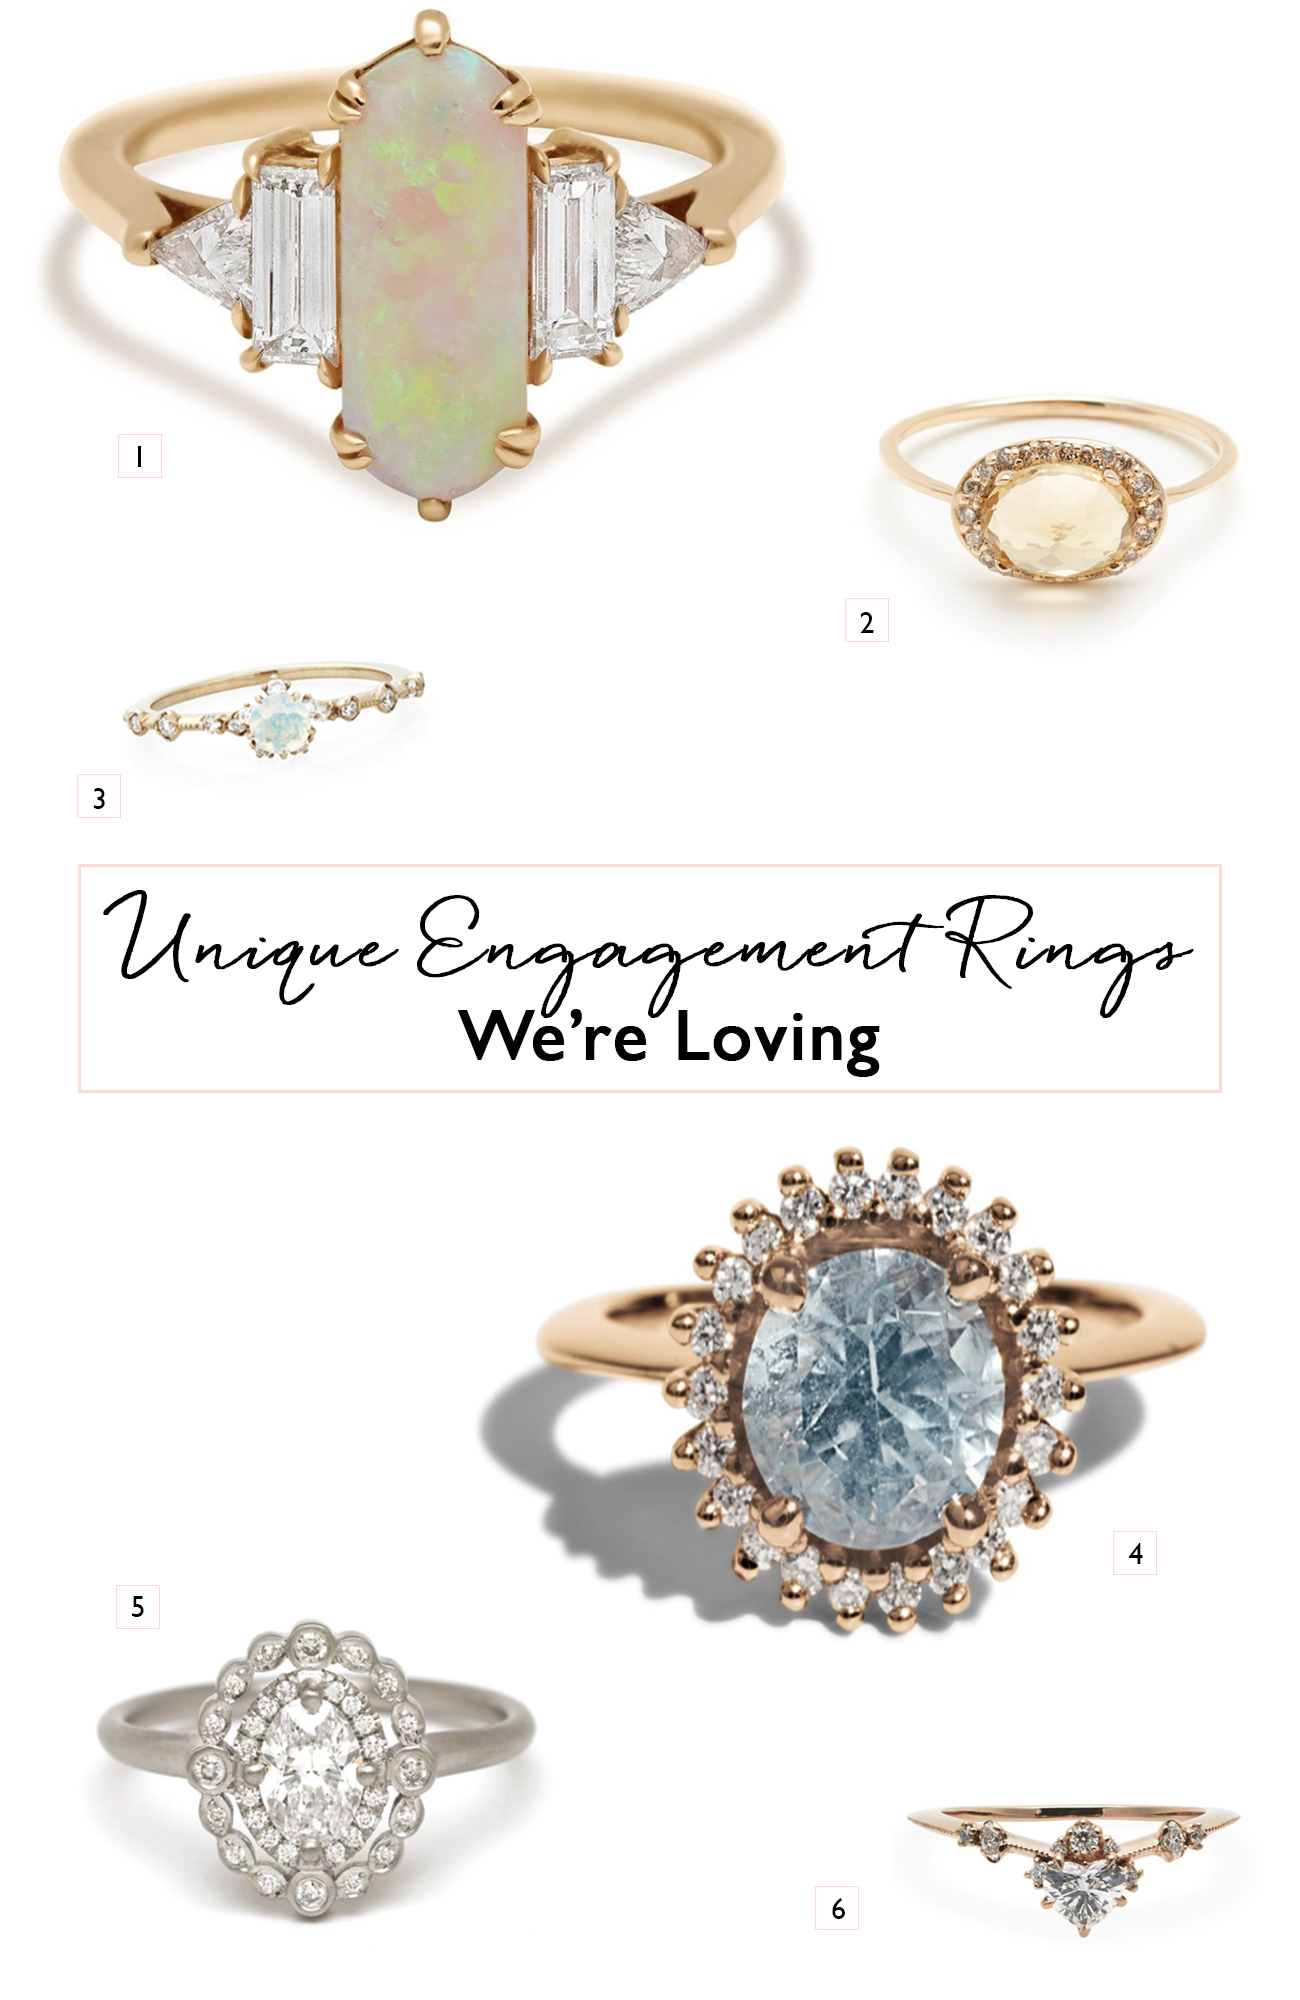 Unique Engagement Ring Collage